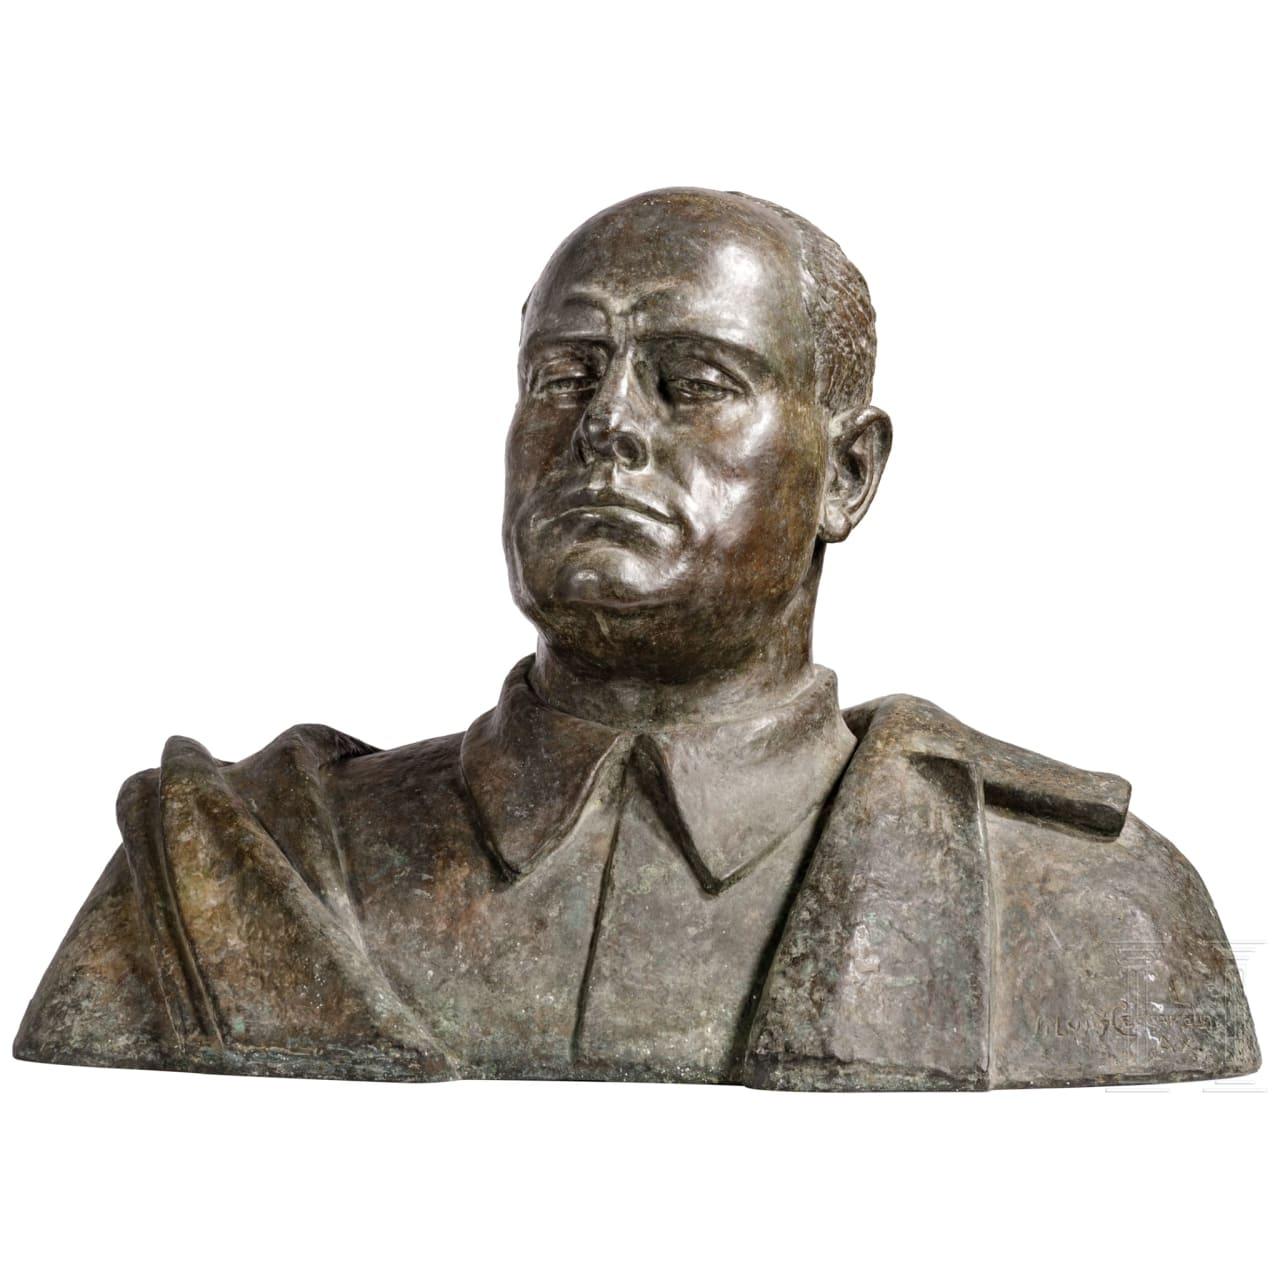 Silvio Ceccarelli (1901 - 1985) - Monumentale Portraitbüste Mussolinis als Richter, datiert 1932